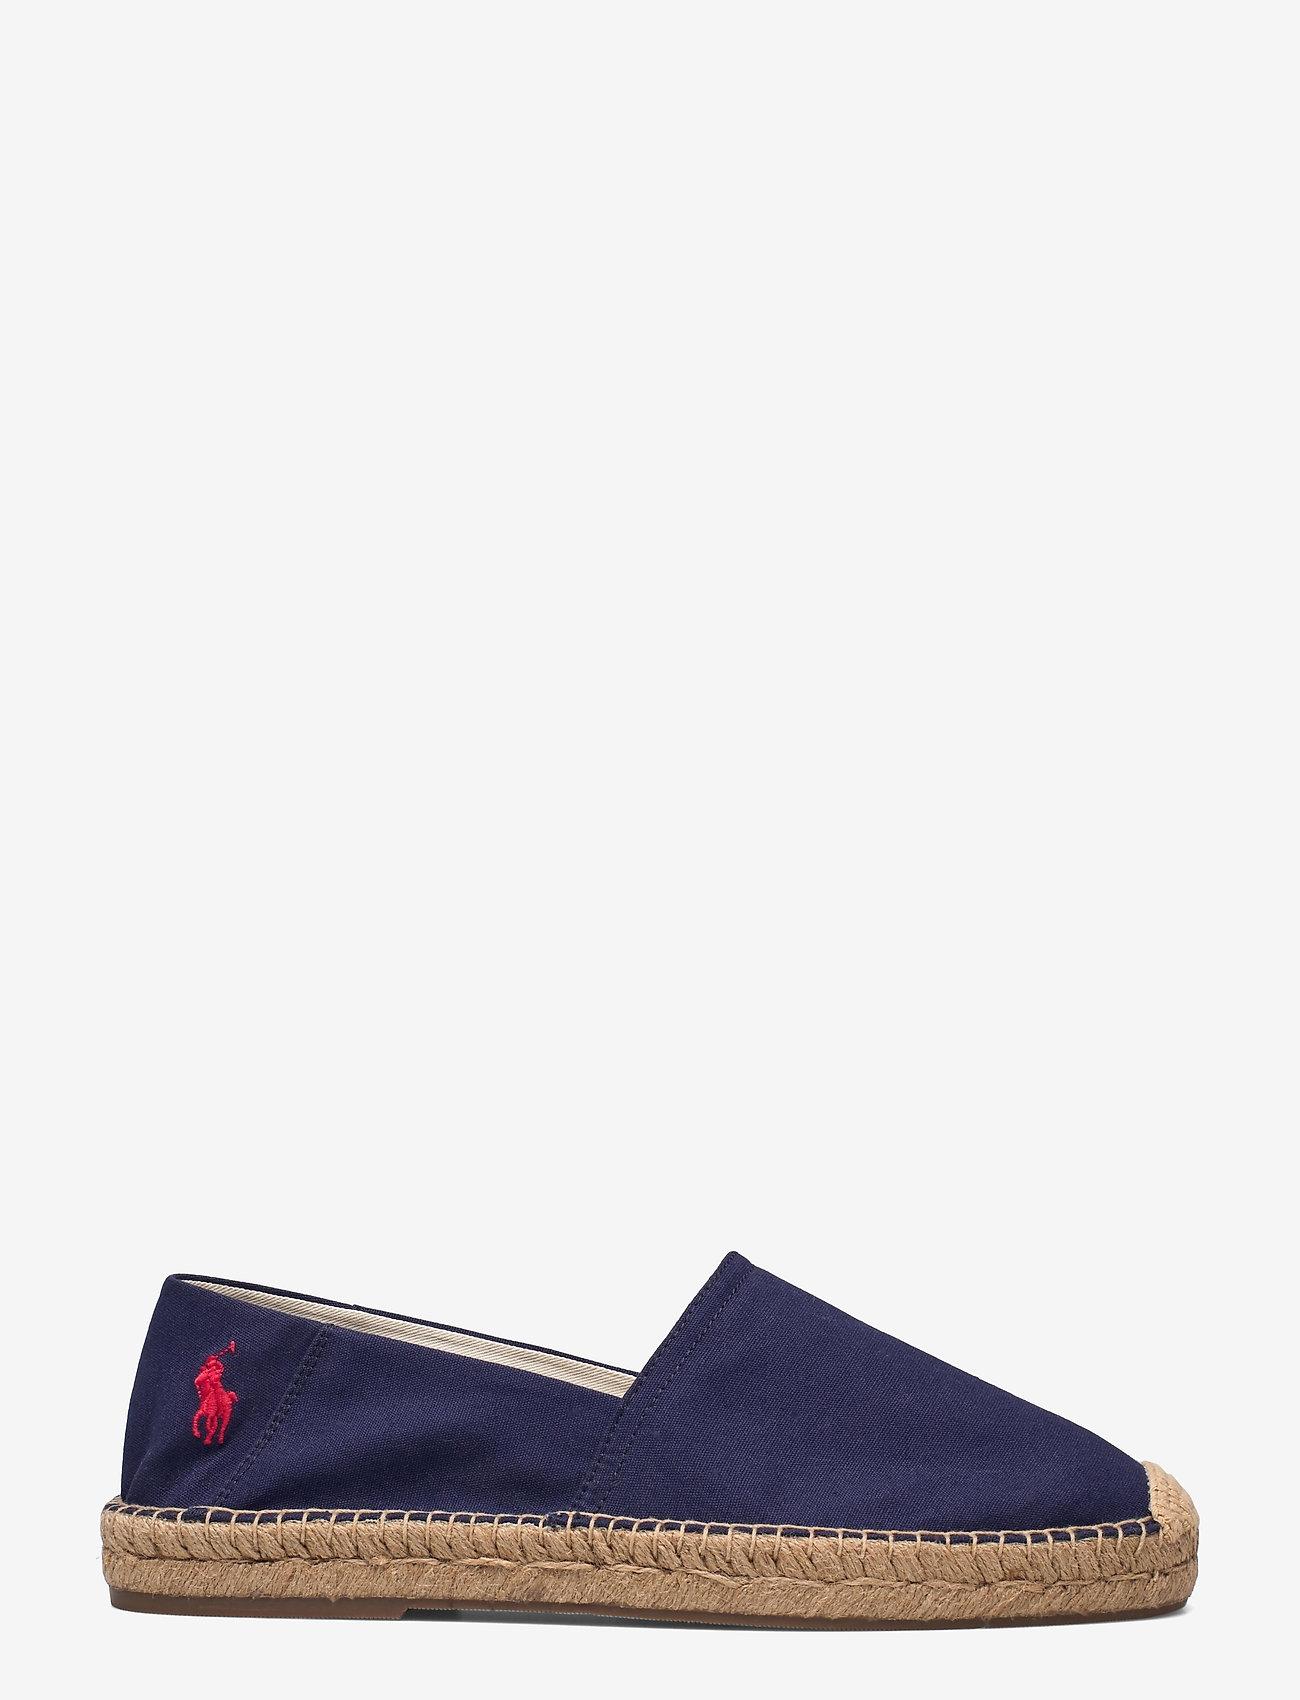 Polo Ralph Lauren - Cevio Cotton Canvas Espadrille - sko - newport navy/red - 1